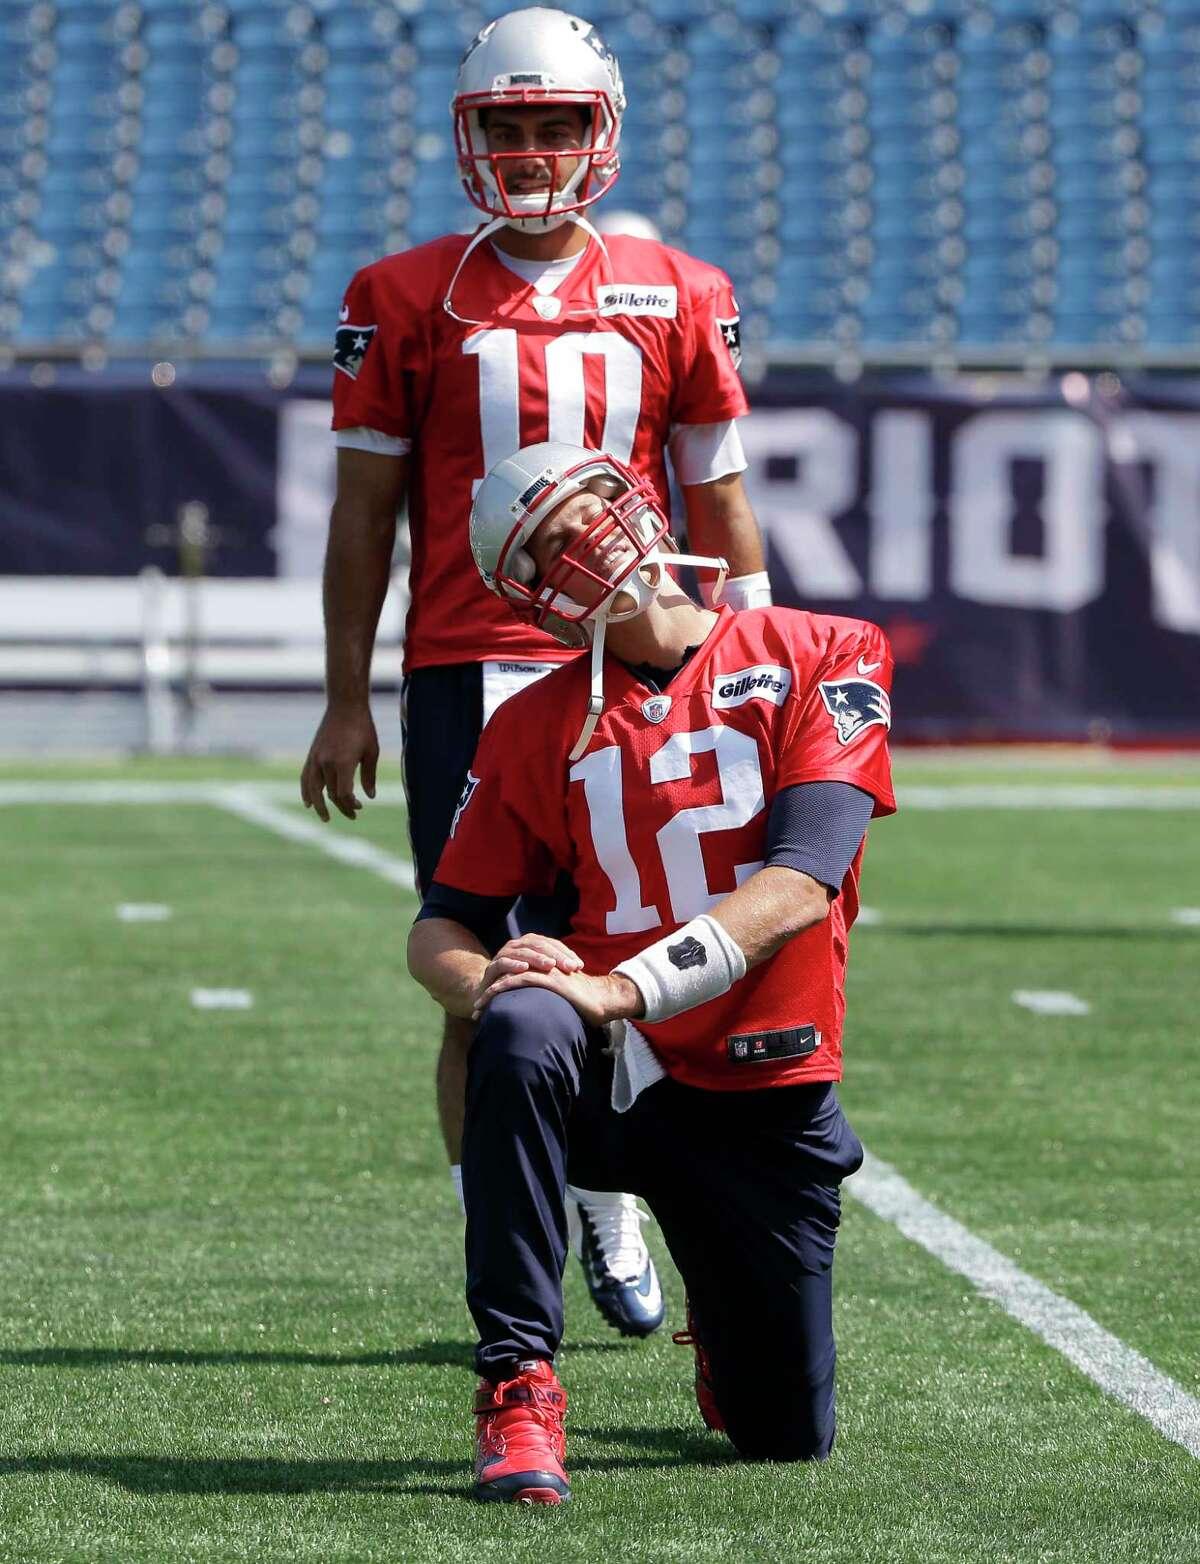 New England Patriots quarterbacks Tom Brady (12) and Jimmy Garoppolo (10) warm up during an NFL football practice, Tuesday, Sept. 5, 2017, in Foxborough, Mass. (AP Photo/Steven Senne) ORG XMIT: MASR101